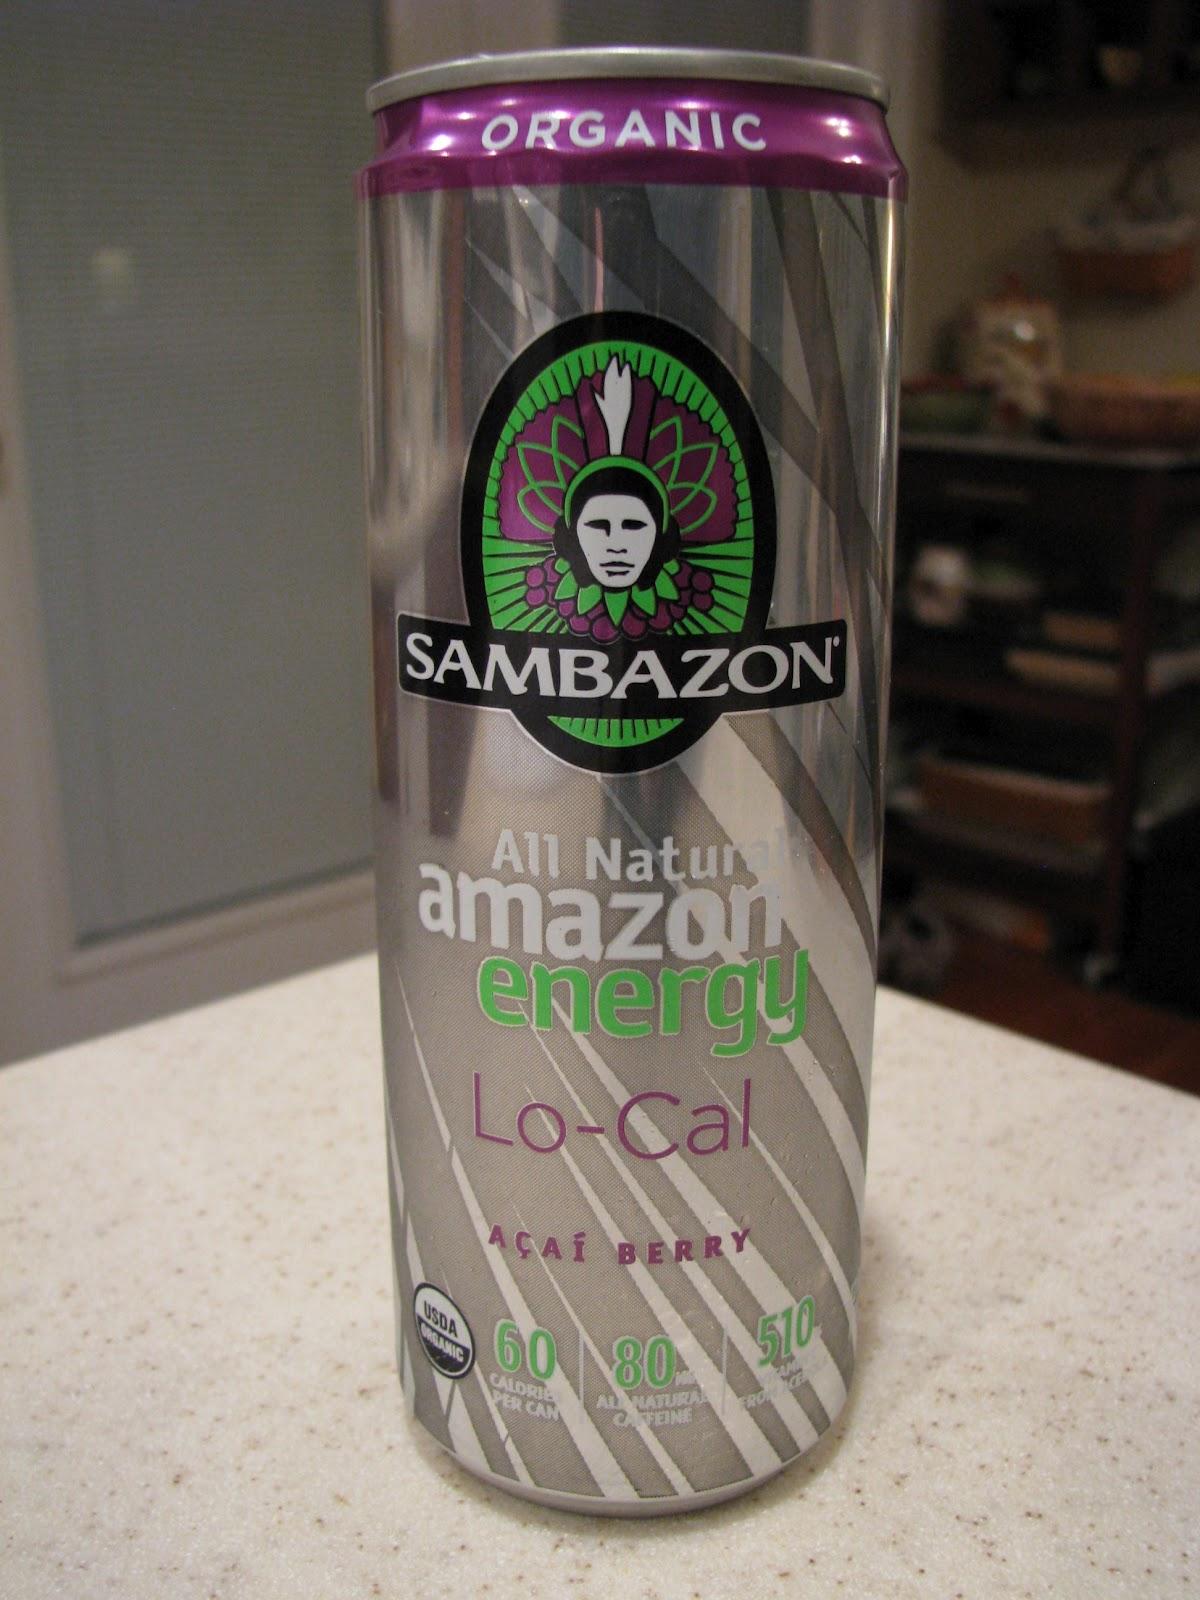 Drinkable Review Sambazon Lo Cal Acai Energy Drink